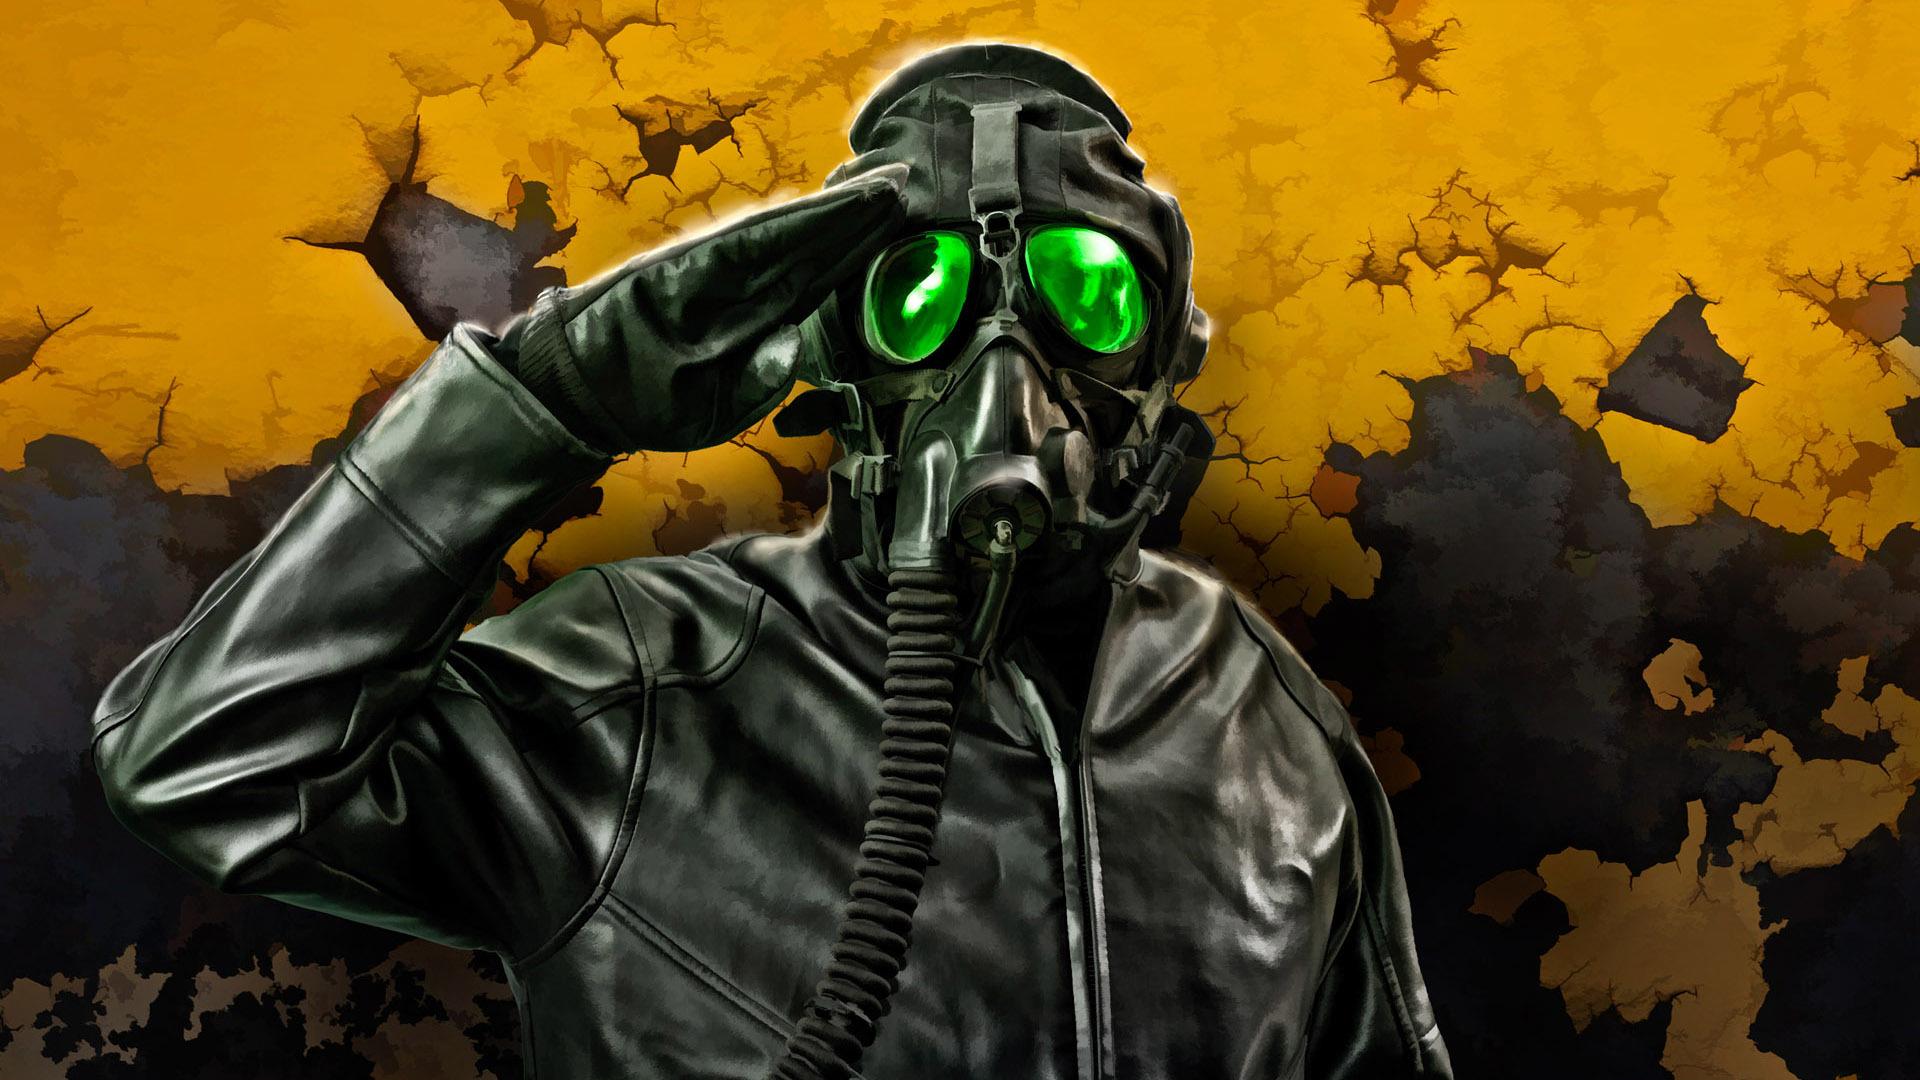 Wearing A Gas Mask Hd Wallpaper Chernobyl Reactor 4 Escape